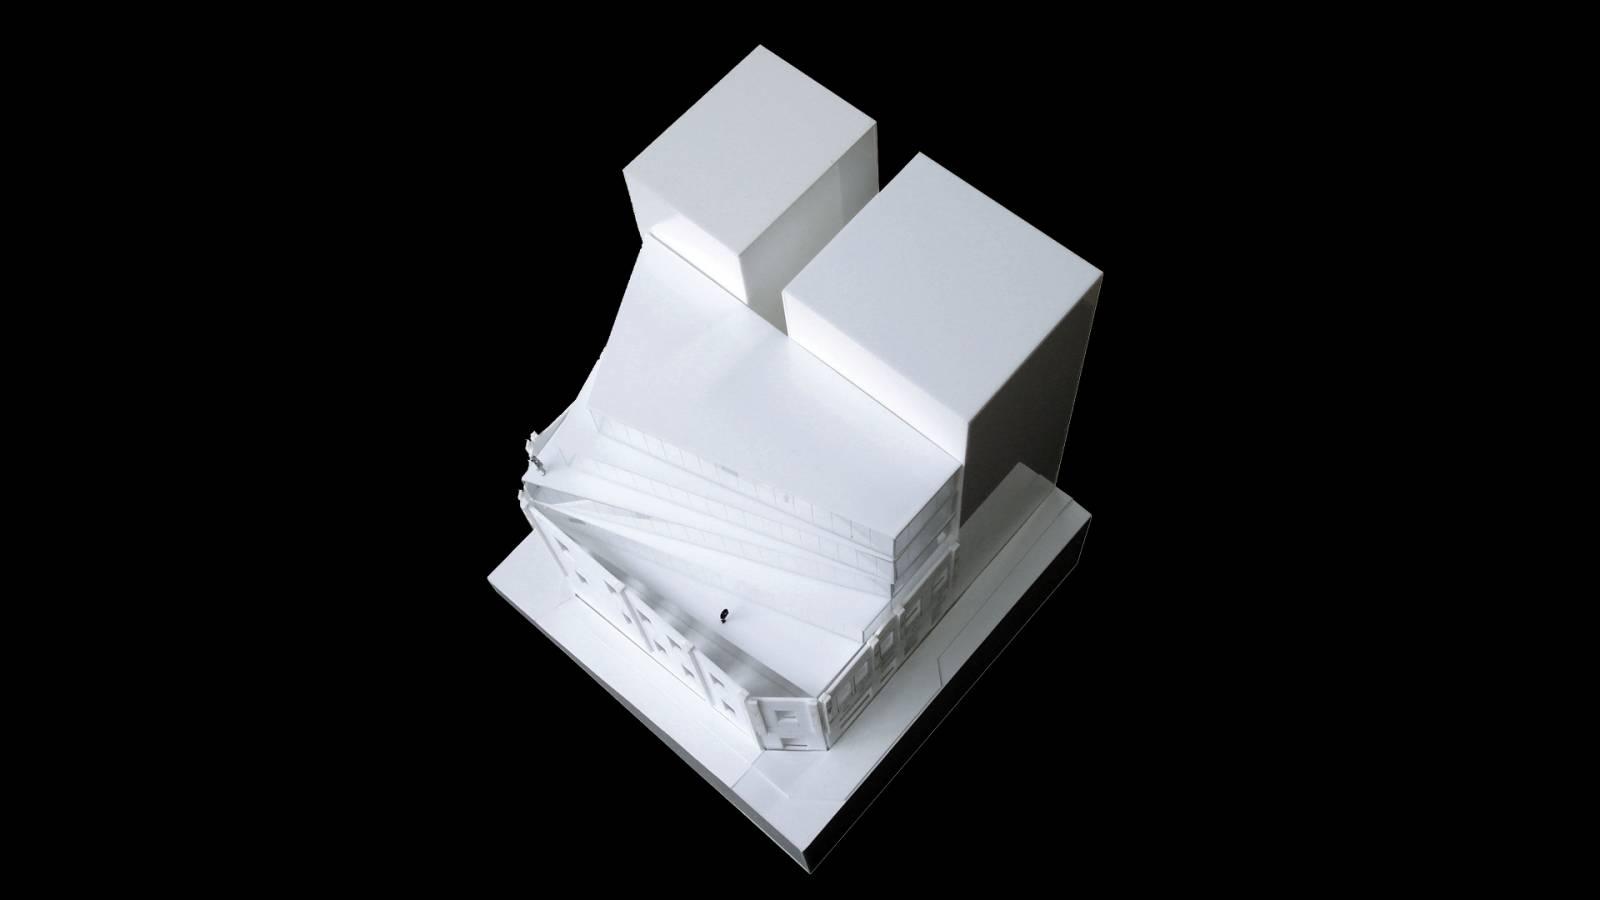 MODEL PHOTO - Delicatessen - SPOL Architects